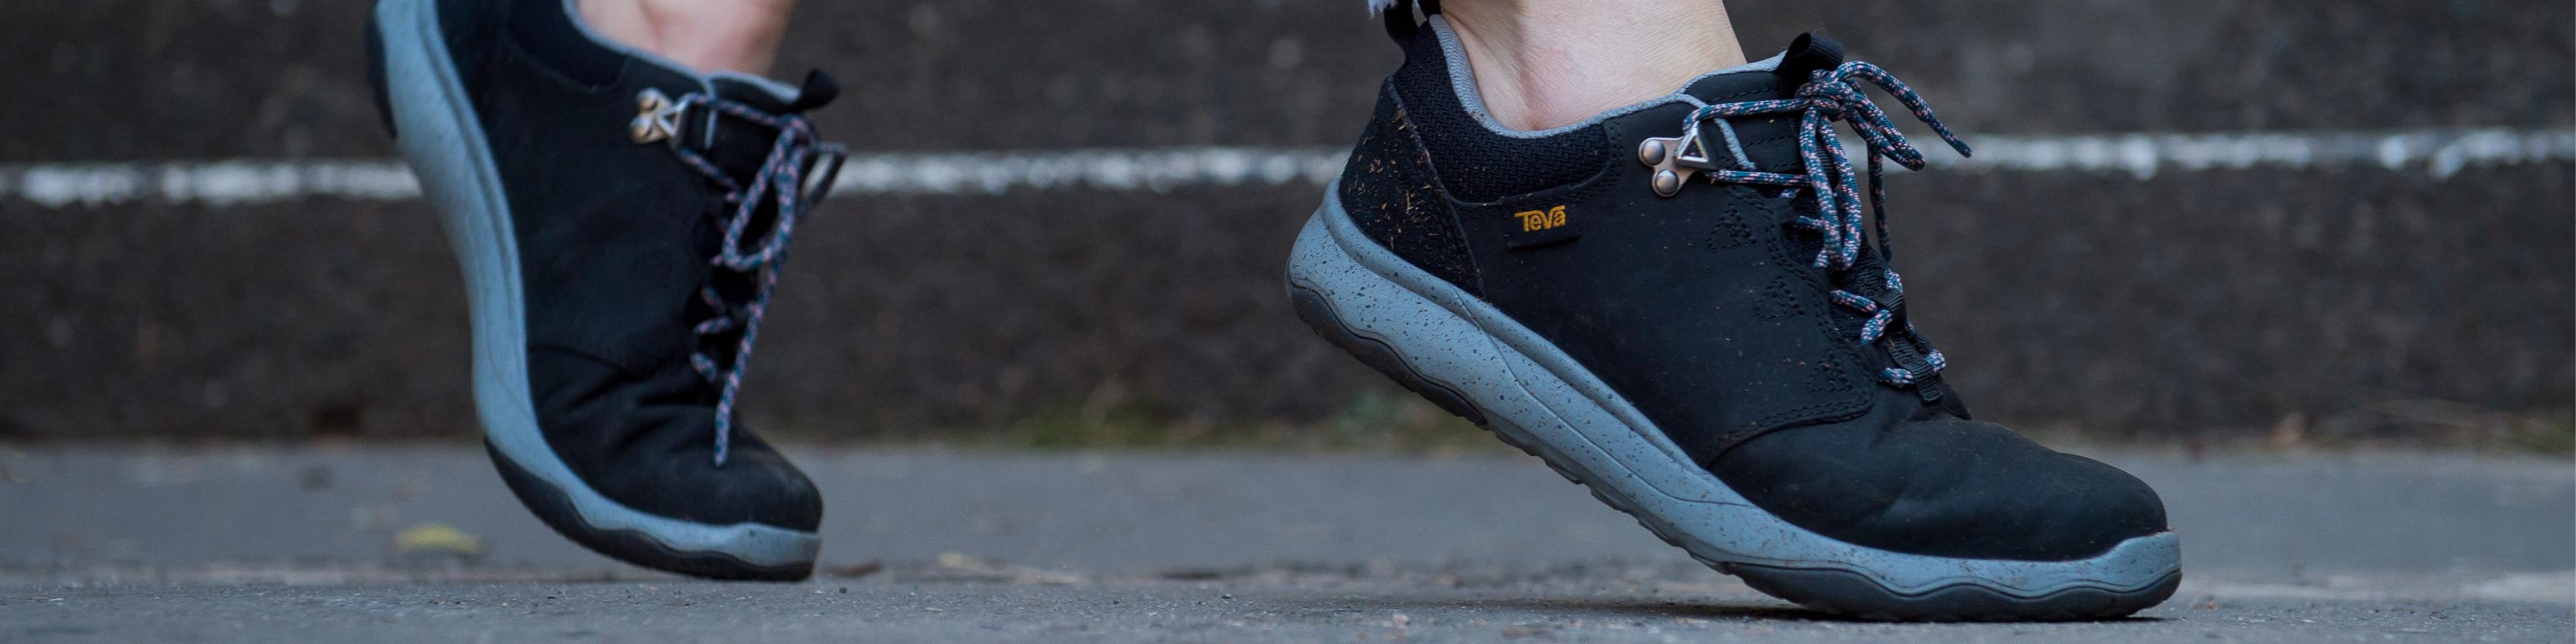 Teva Women's Shoes